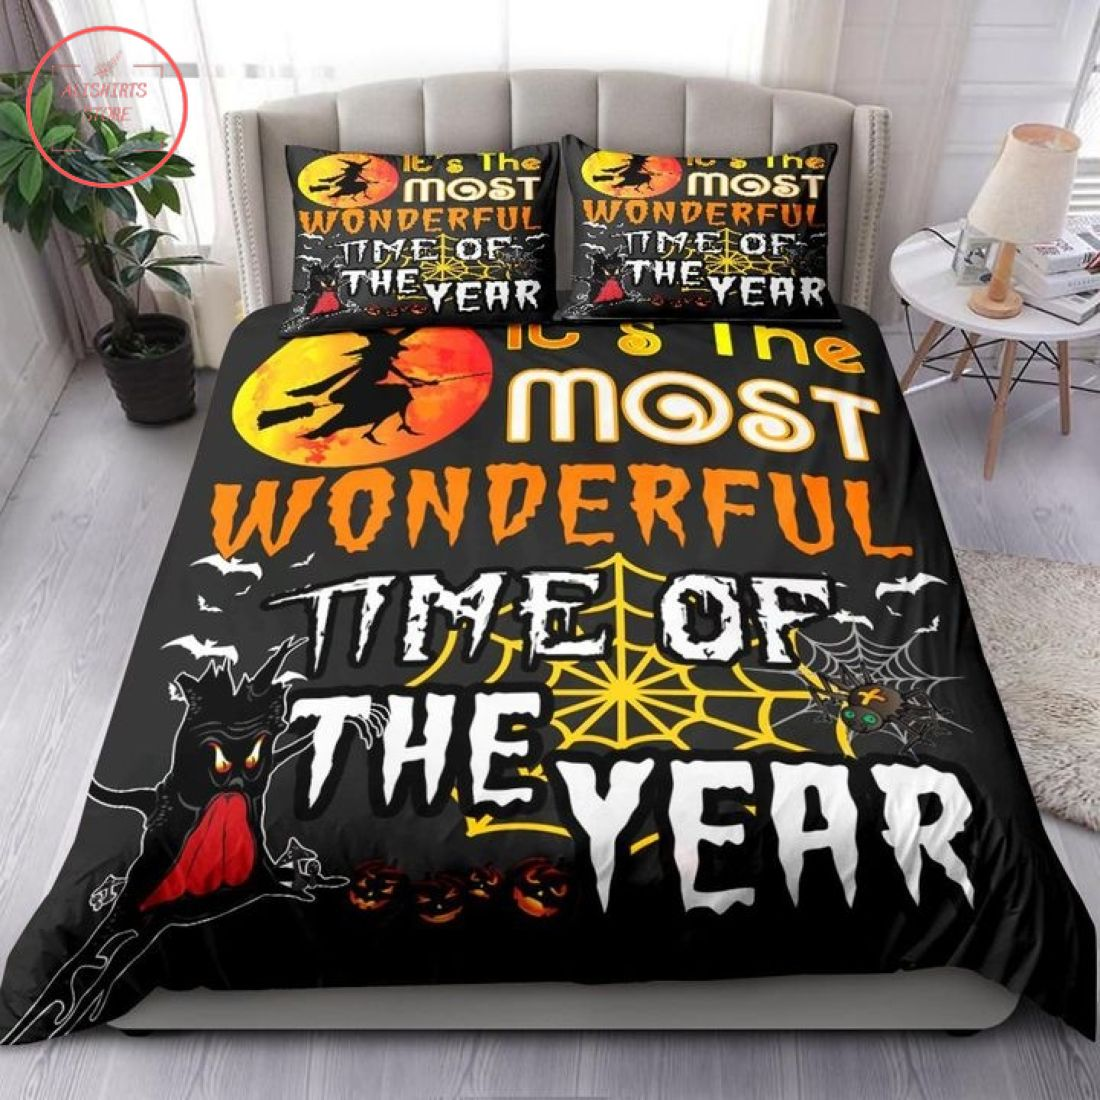 Wonderful Time of Year Halloween Blanket